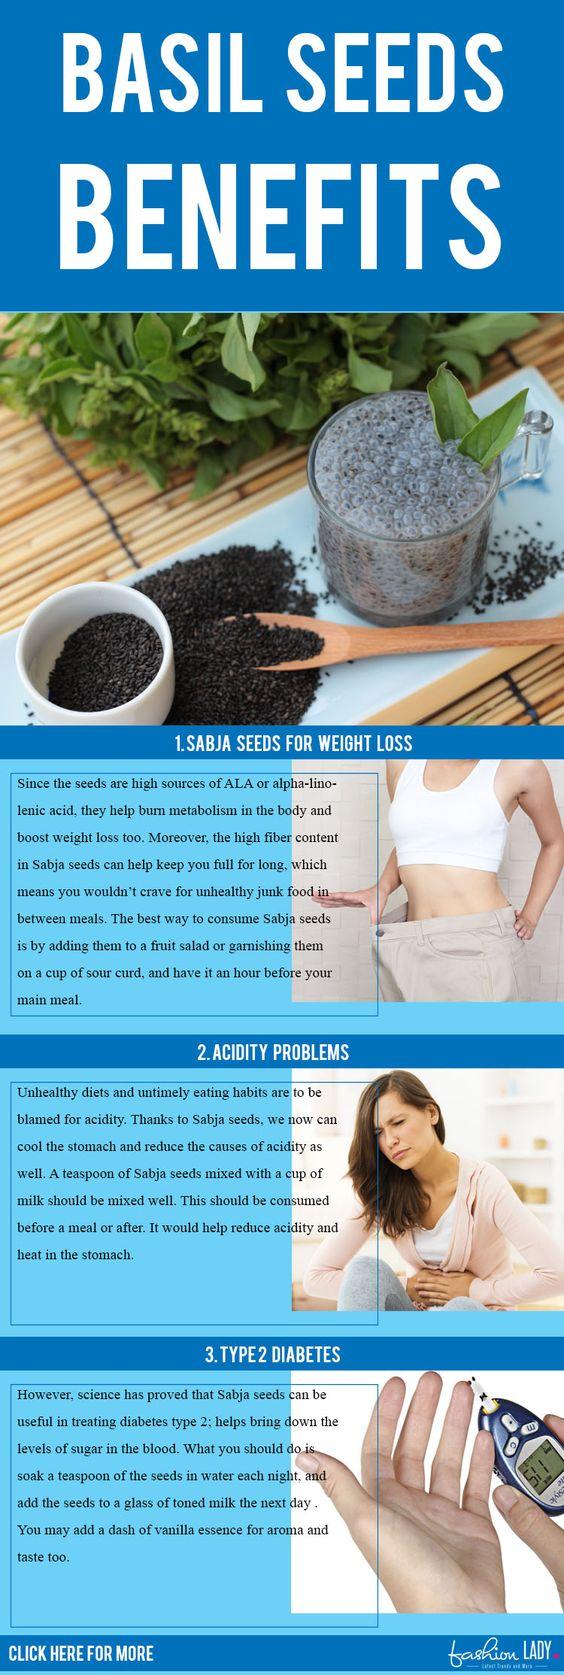 22 Hidden Basil Seeds (Sabja Seeds) Benefits For Health